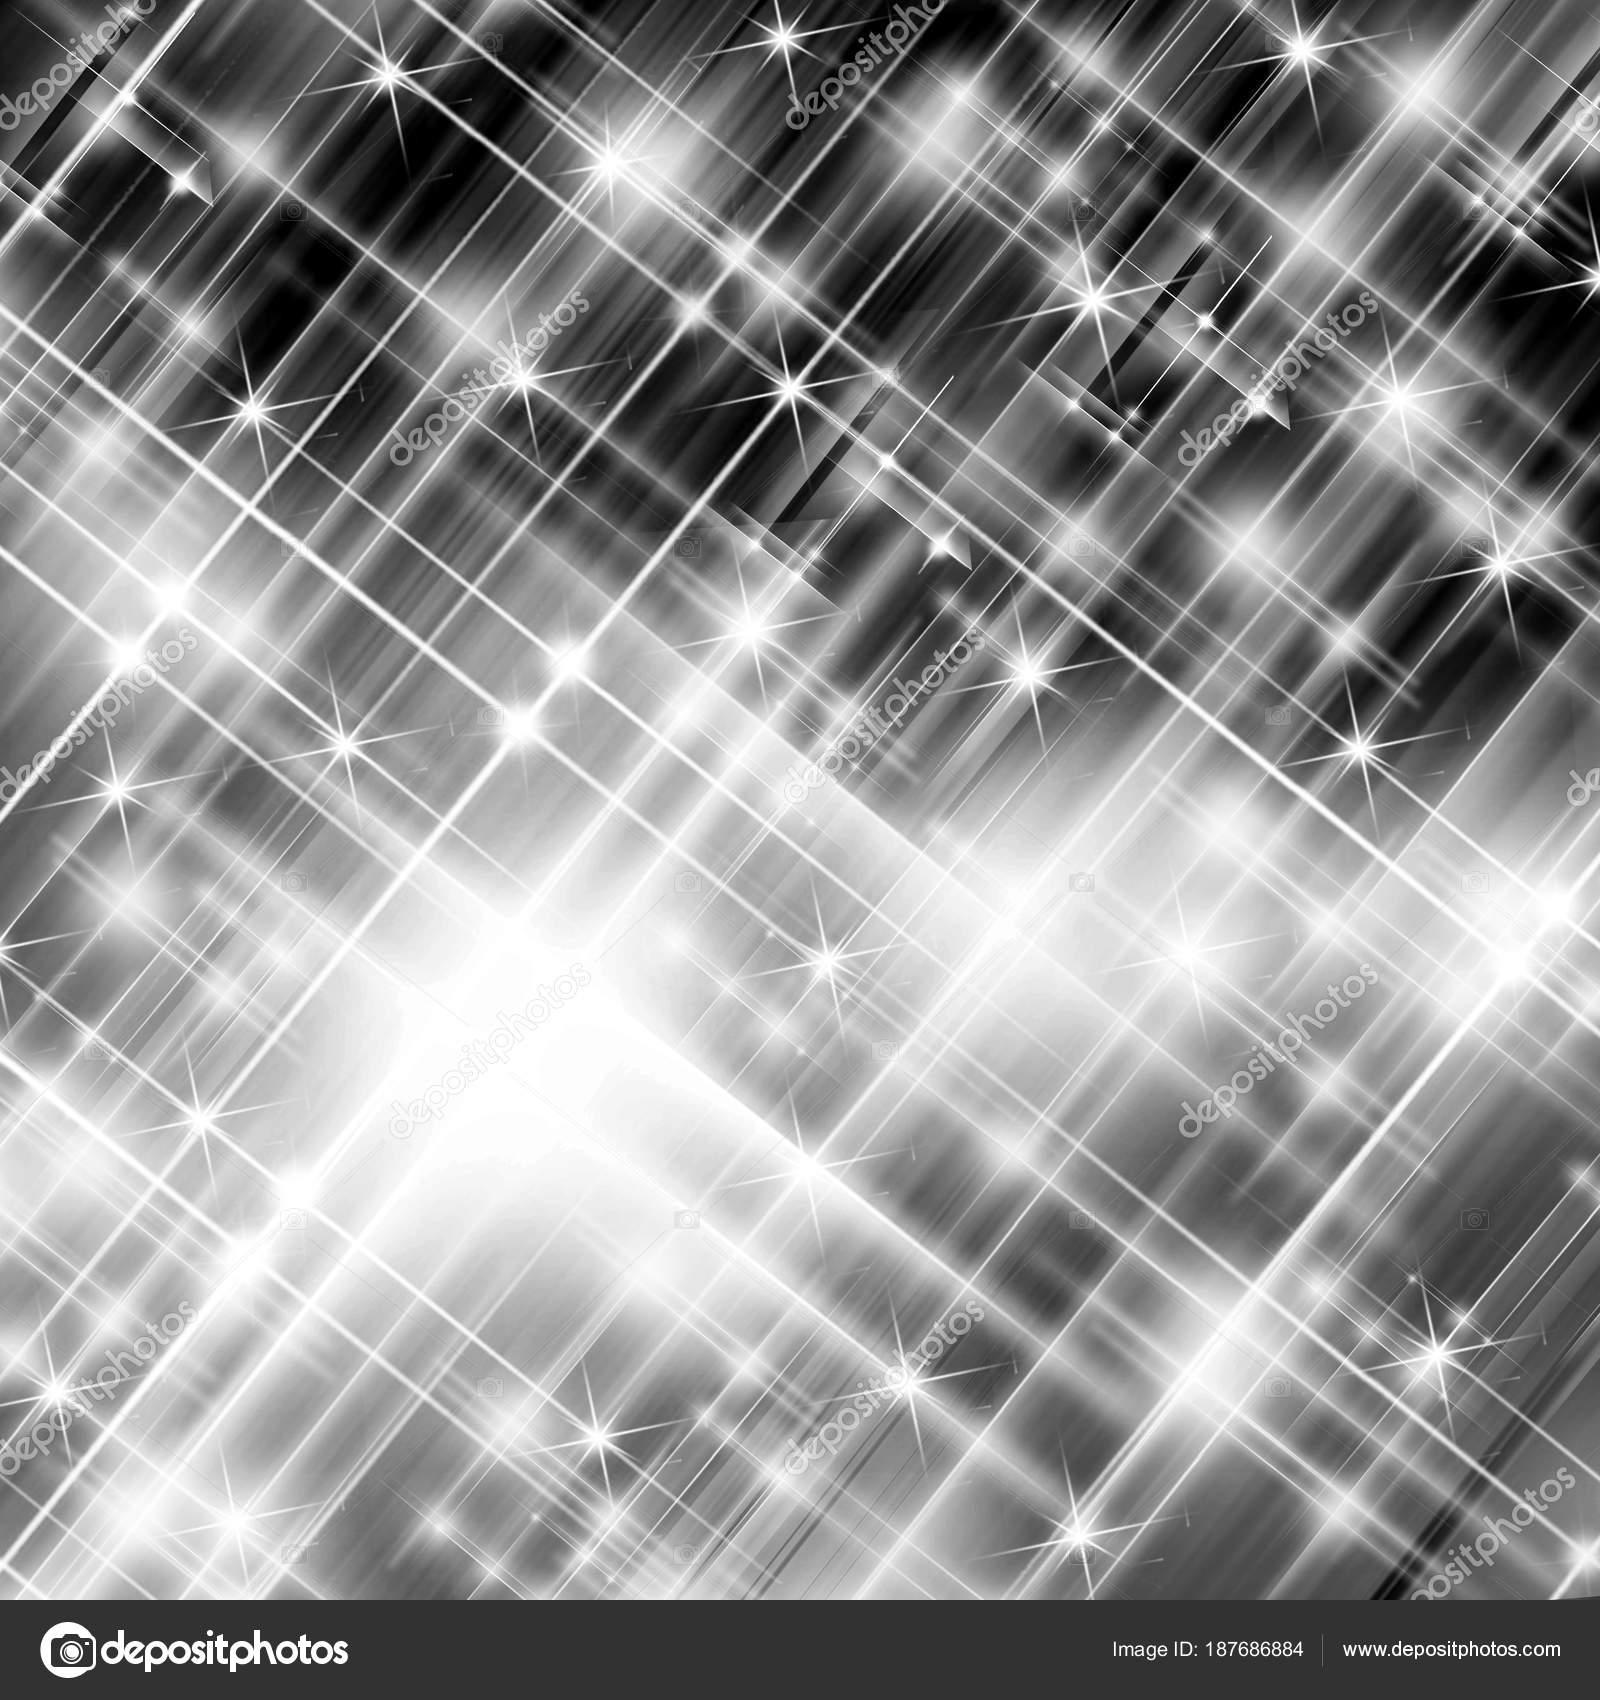 Abstract Black And White Glowing Background ⬇ Stock Photo, Image By ©  Vamariyav #187686884